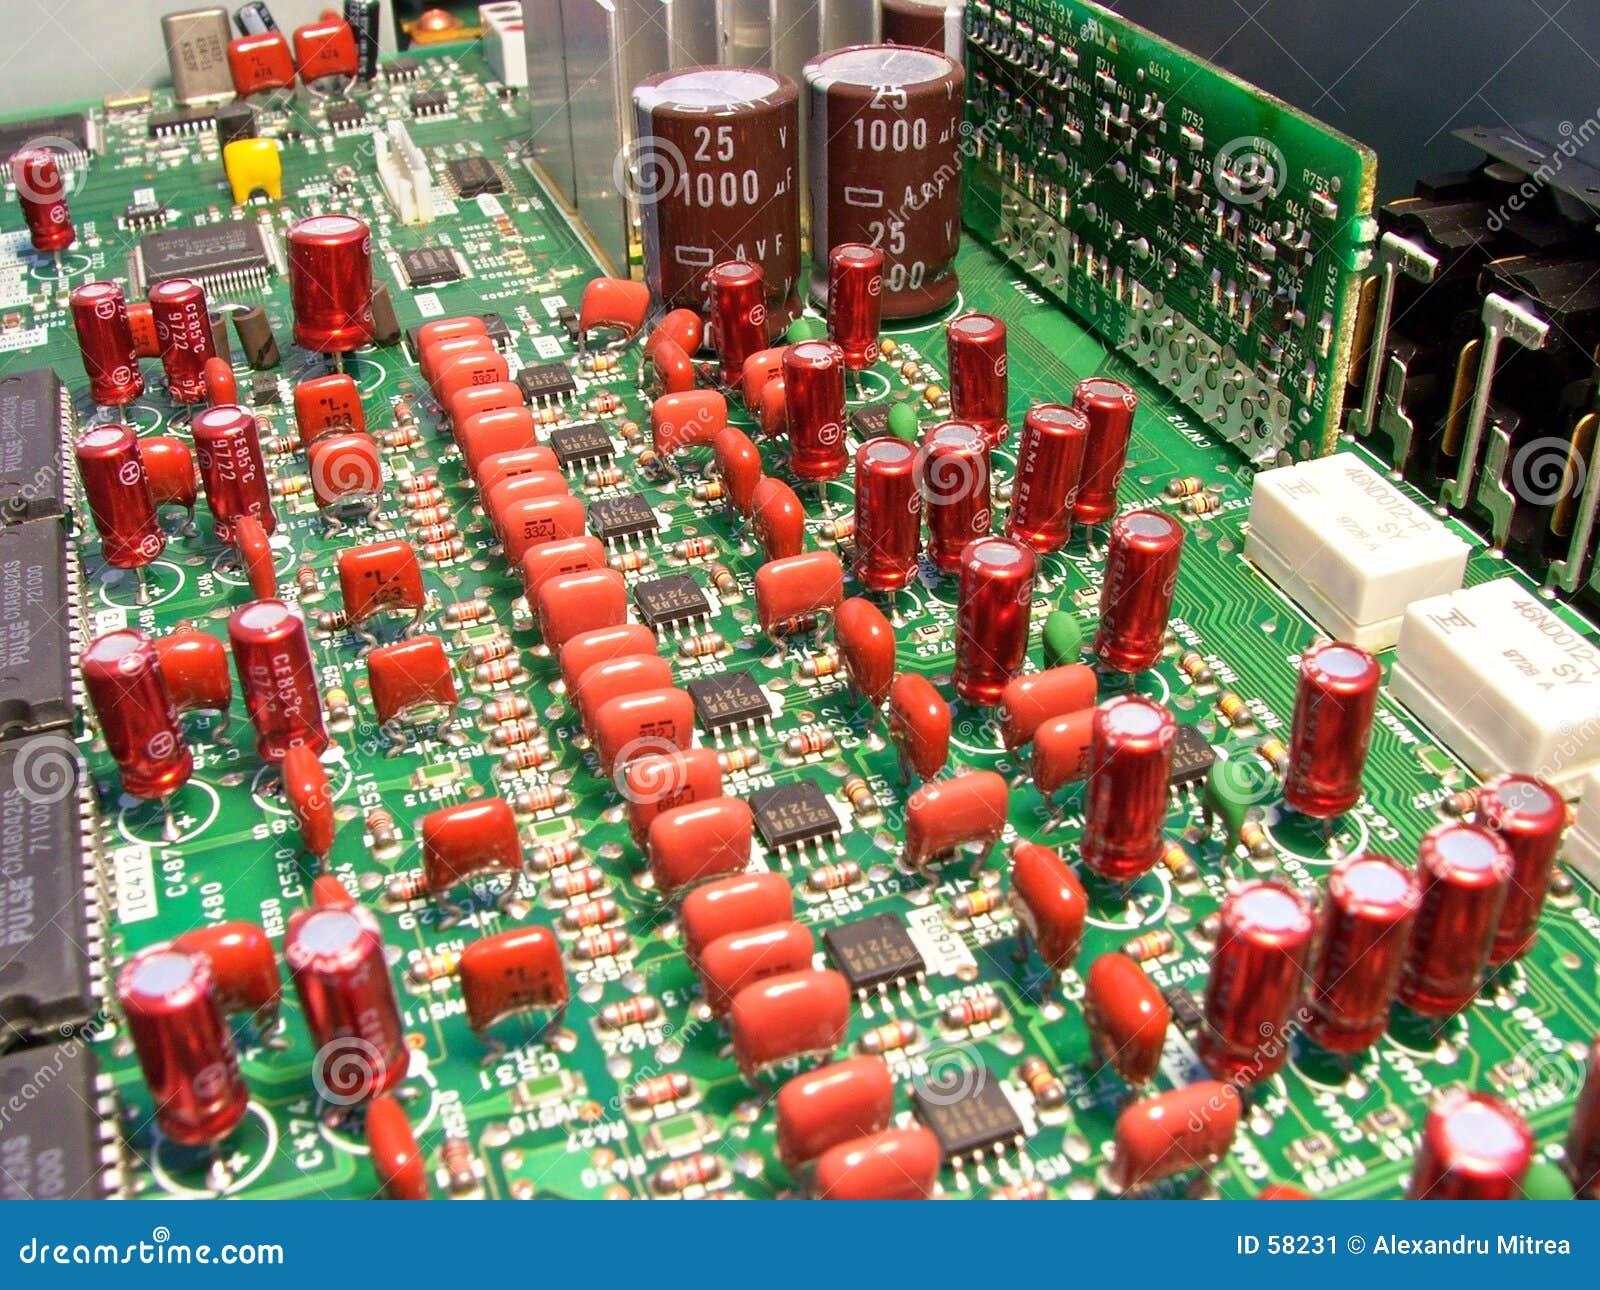 Circuits elektroniskt